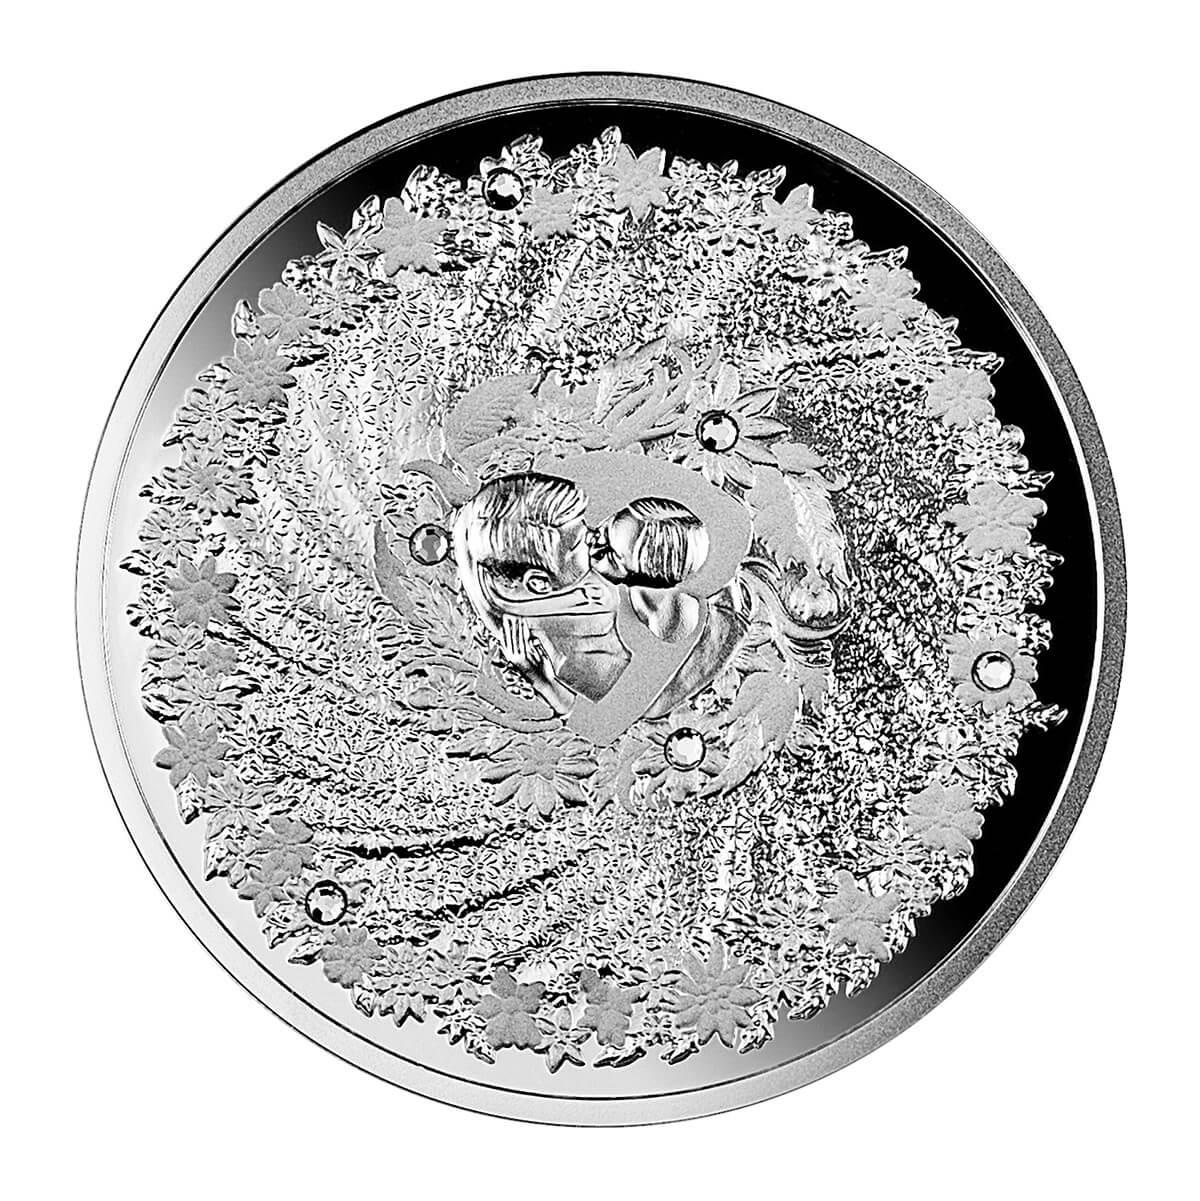 Moneta ślubna, 2 dolary